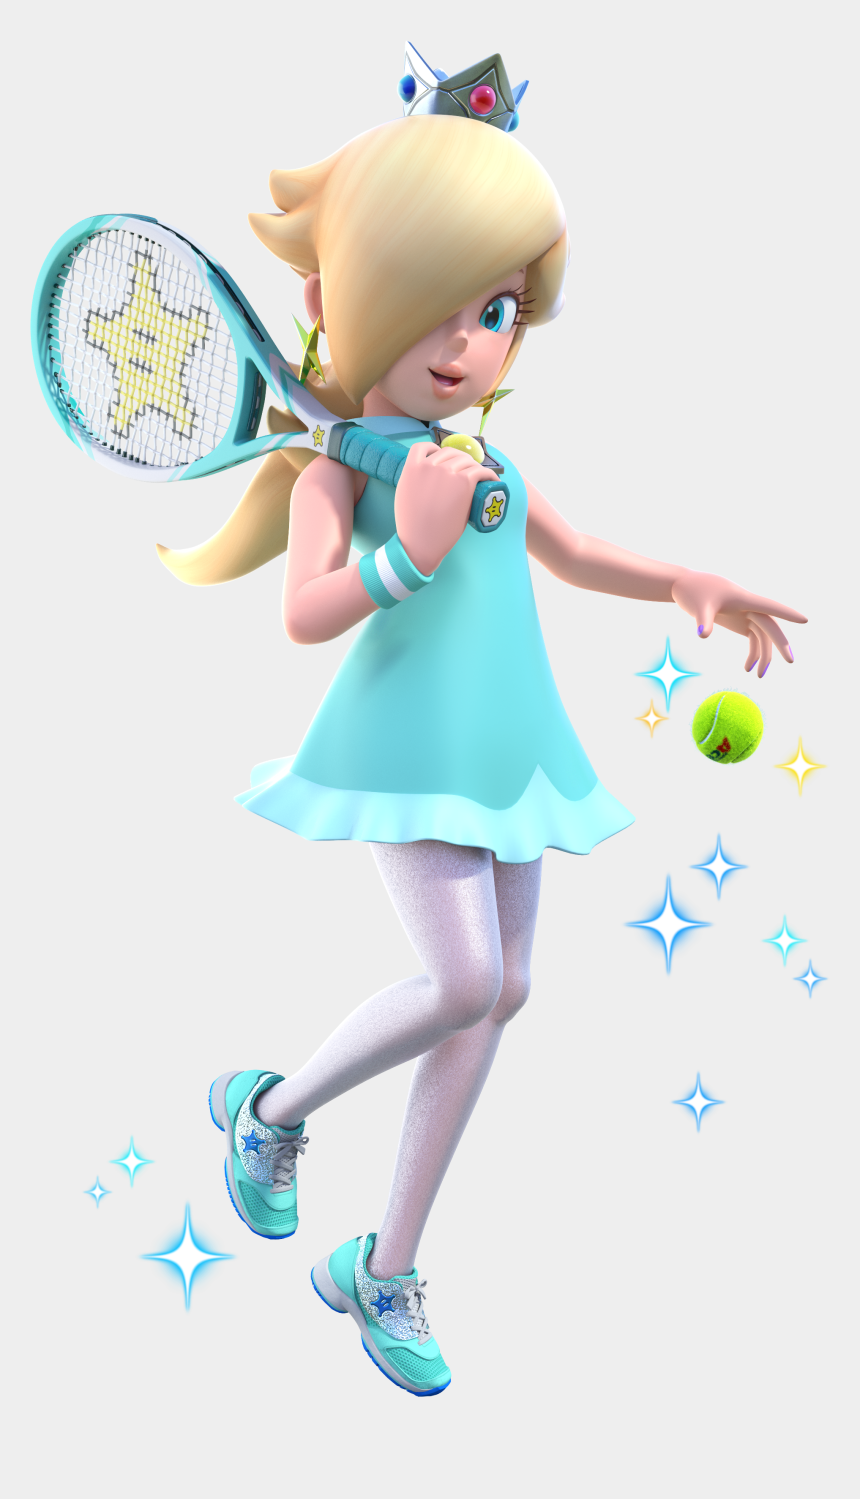 crafter clipart, Cartoons - Princess Peach Clipart Rosalina - Super Mario Tennis Aces Rosalina